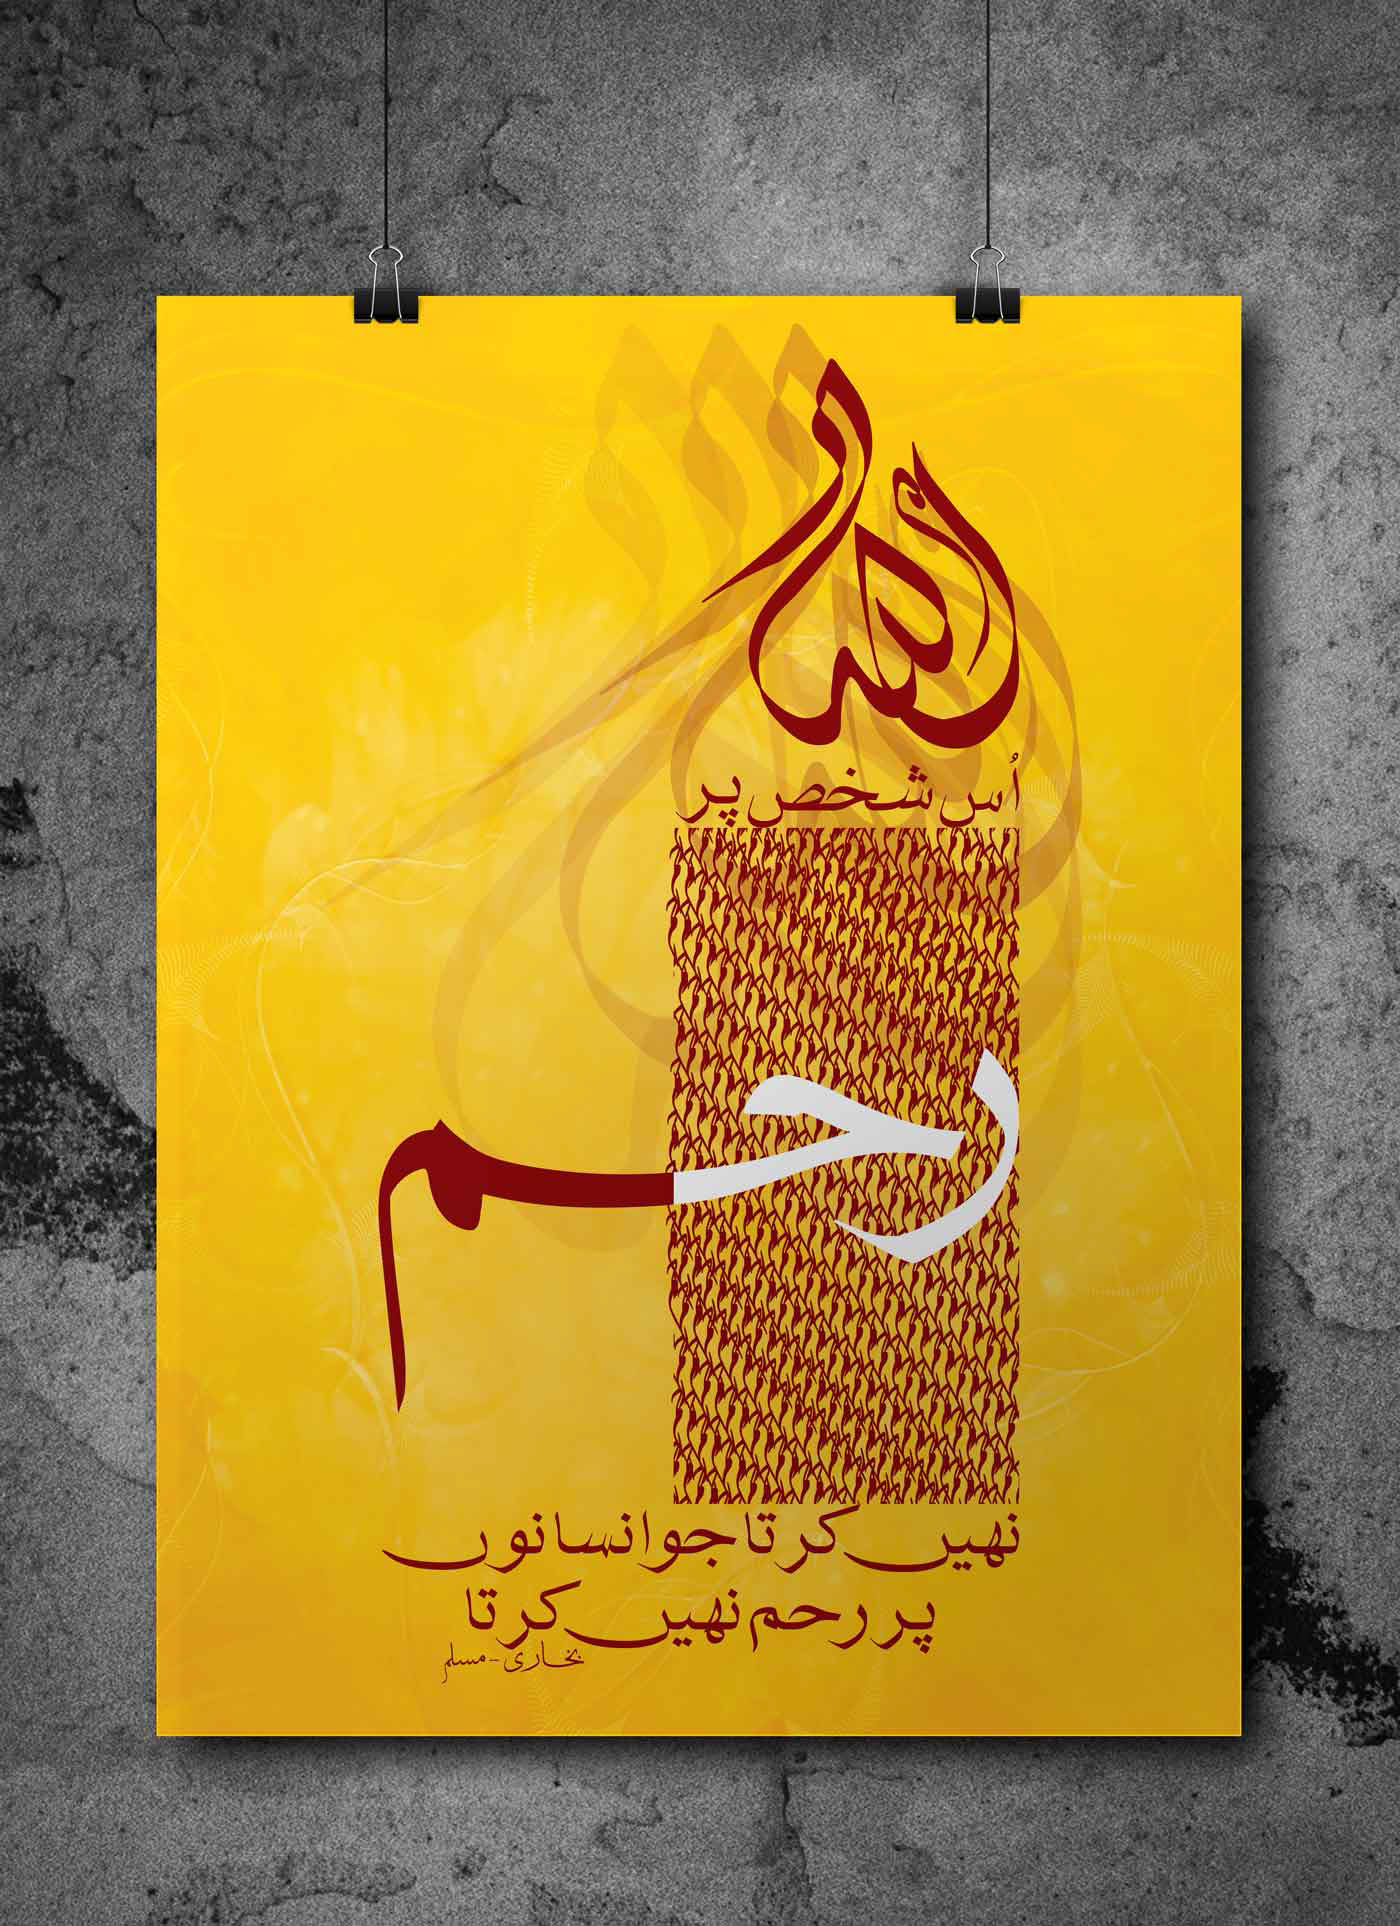 graphic design compassion campaign Illustrator PHTOSHOP allah Reham thesis poster